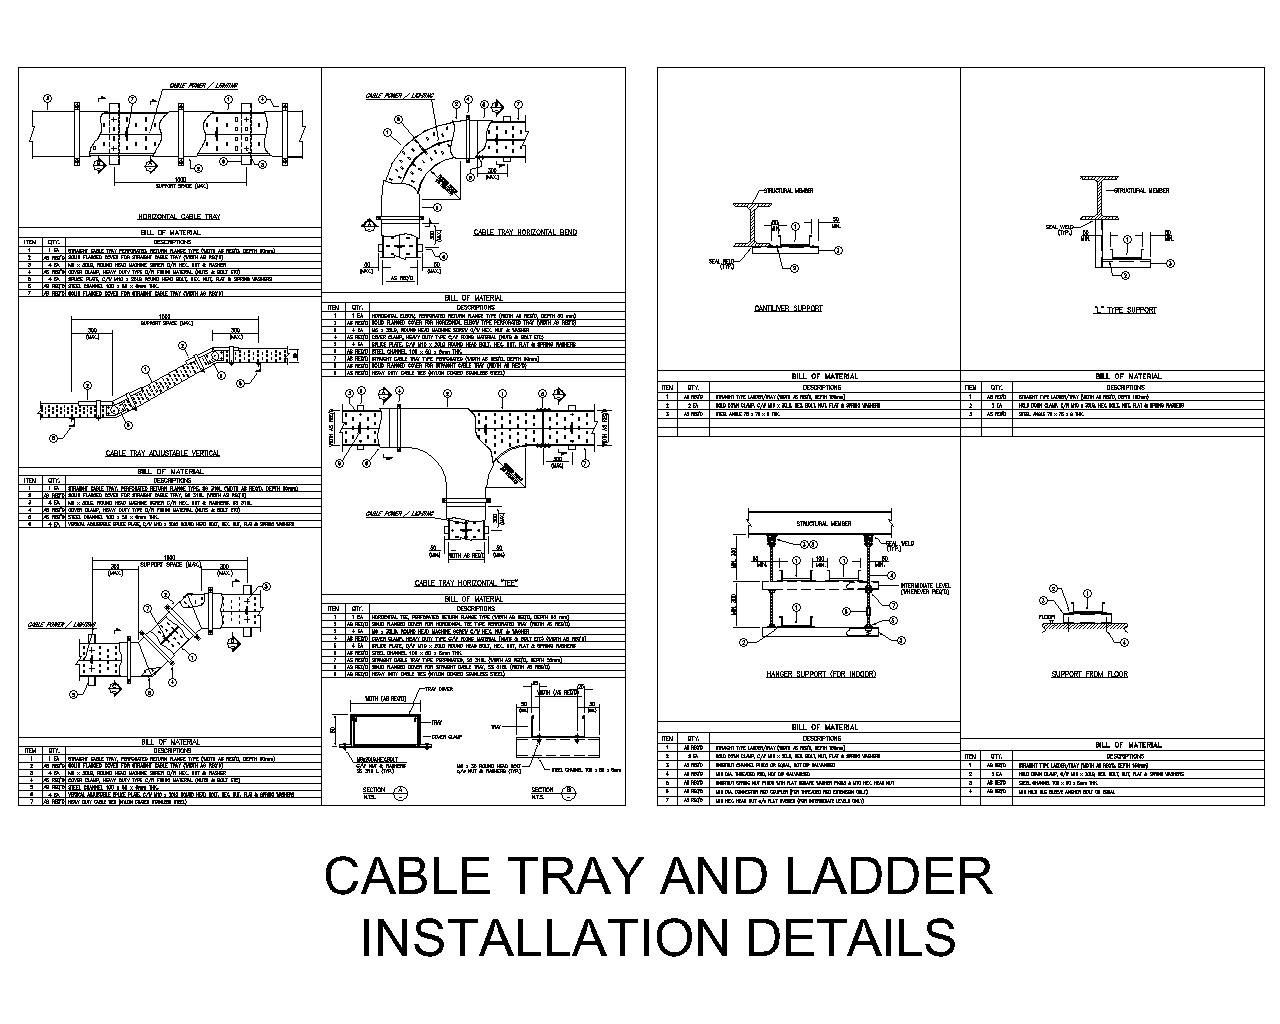 Ladder Details Stlfamilylife